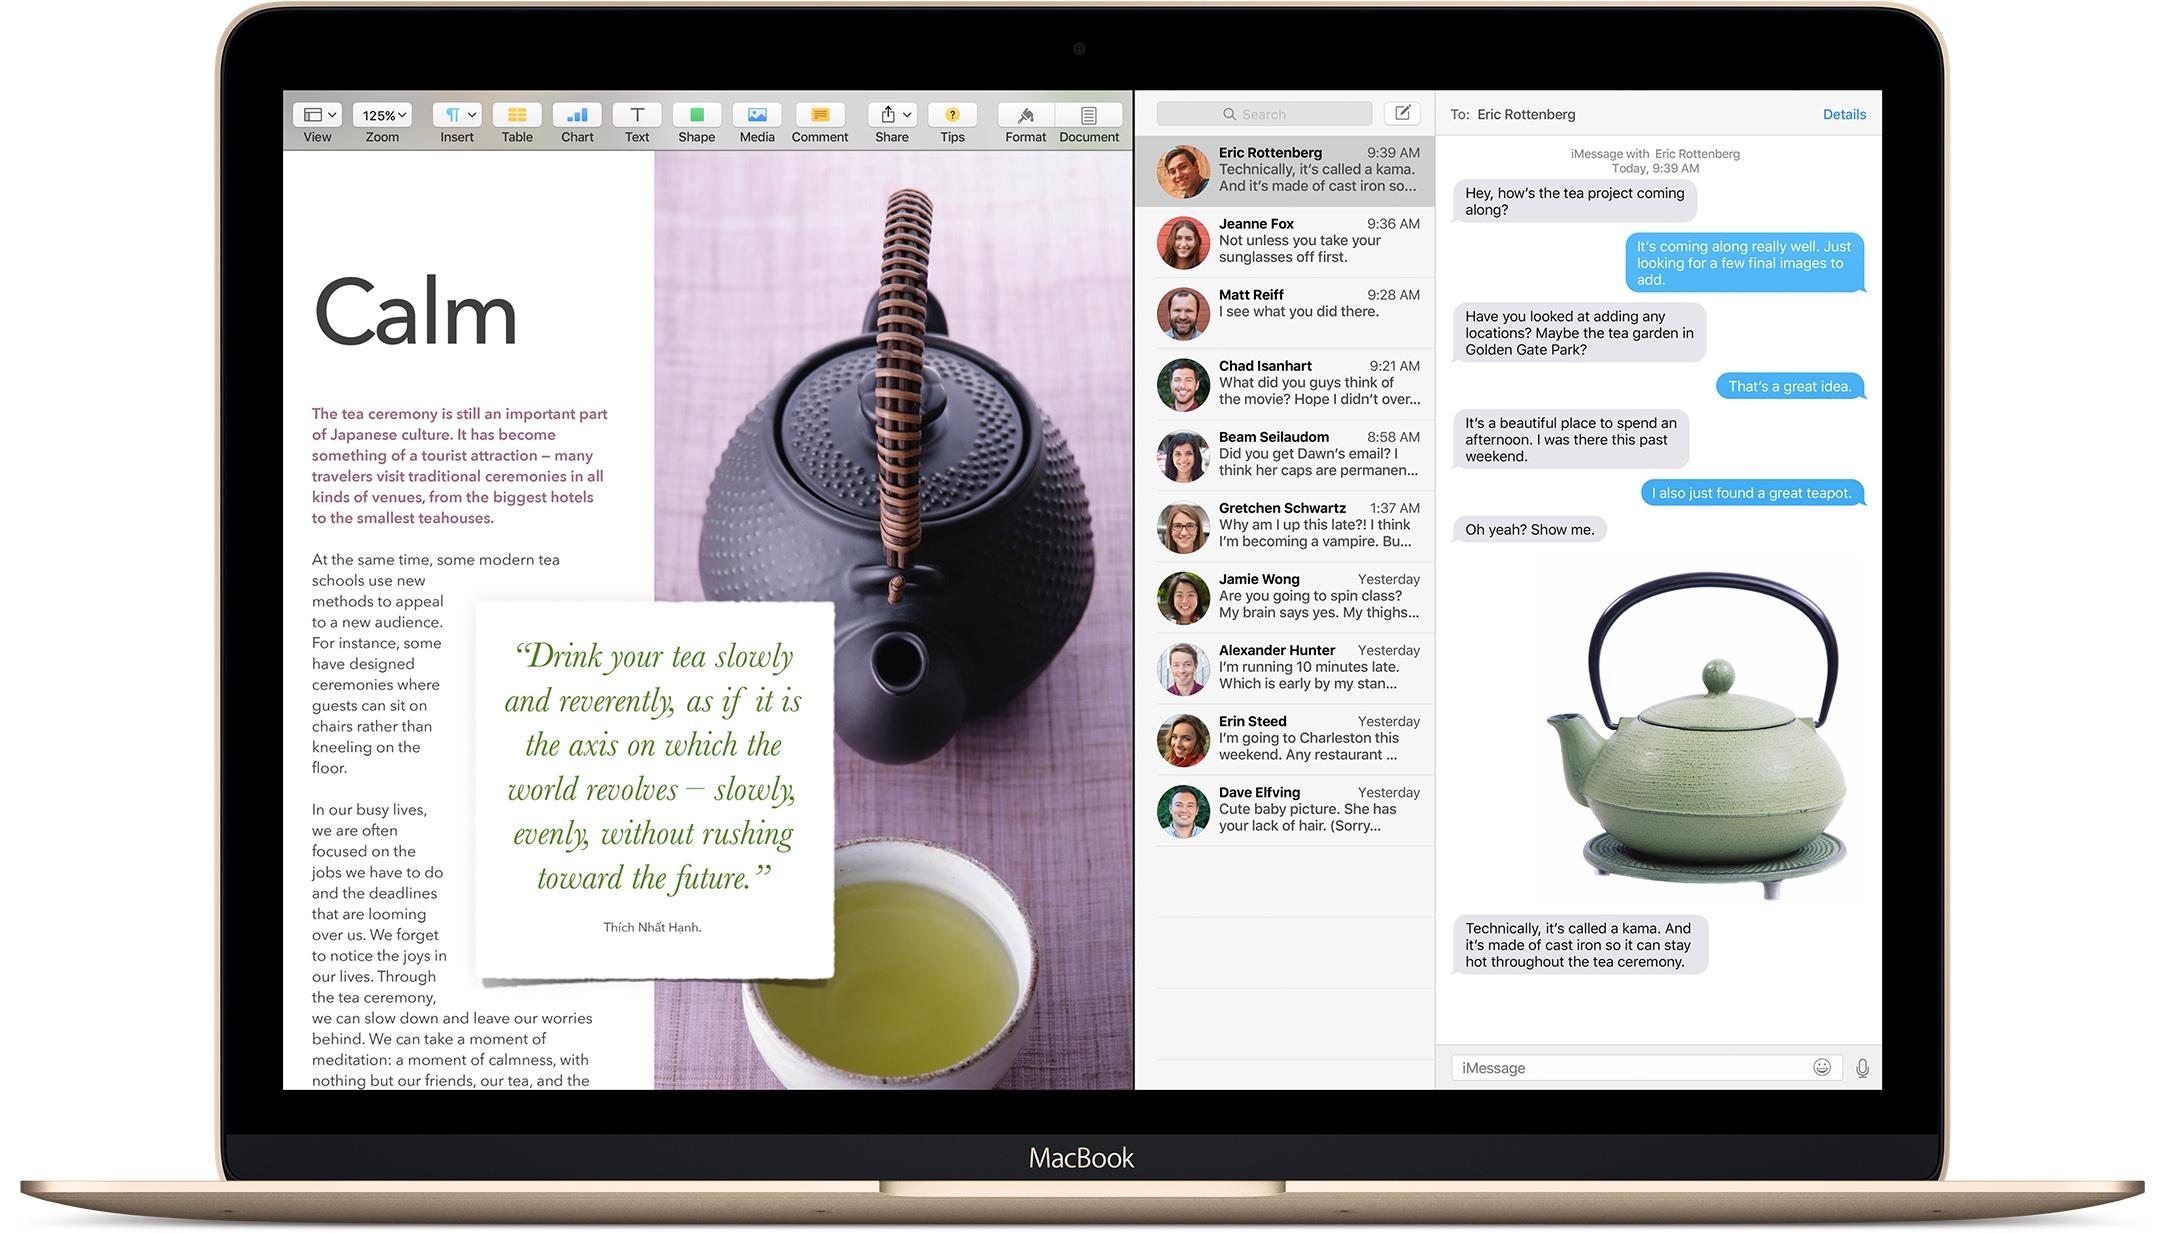 OS X El Capitan Split View image 001